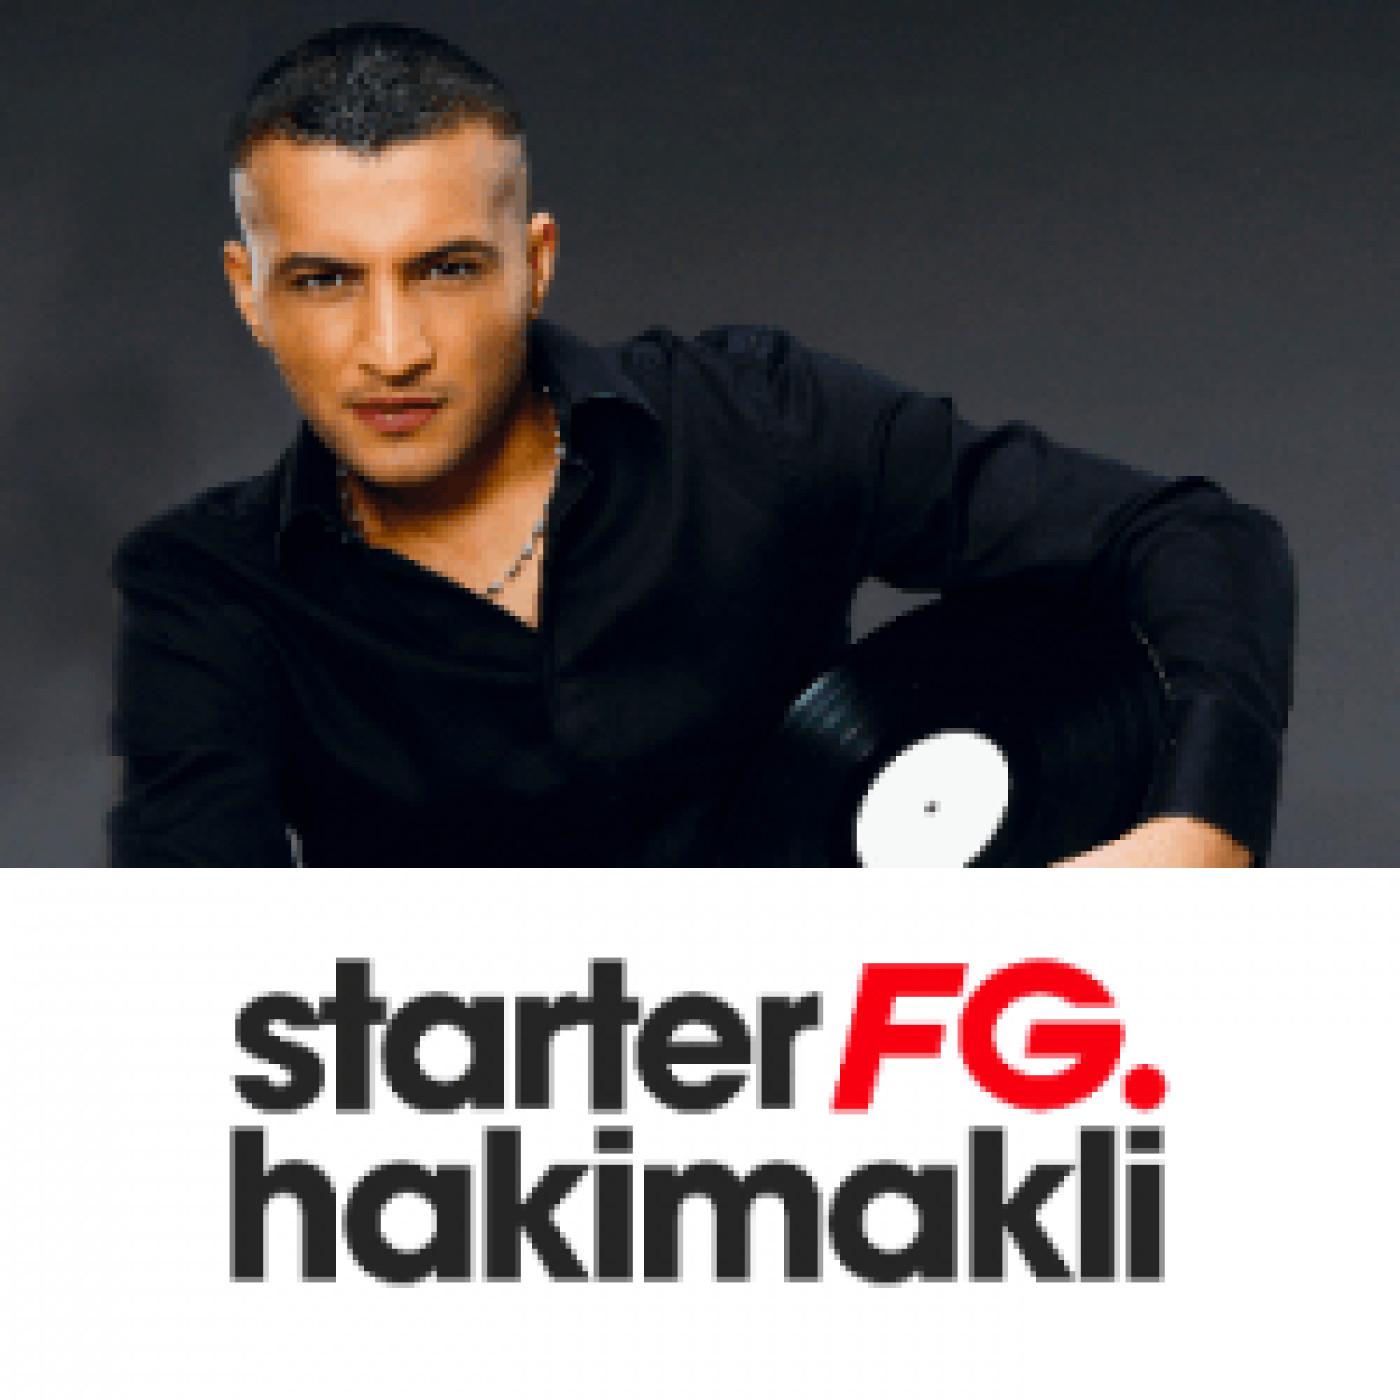 STARTER FG BY HAKIMAKLI LUNDI 4 JANVIER 2021